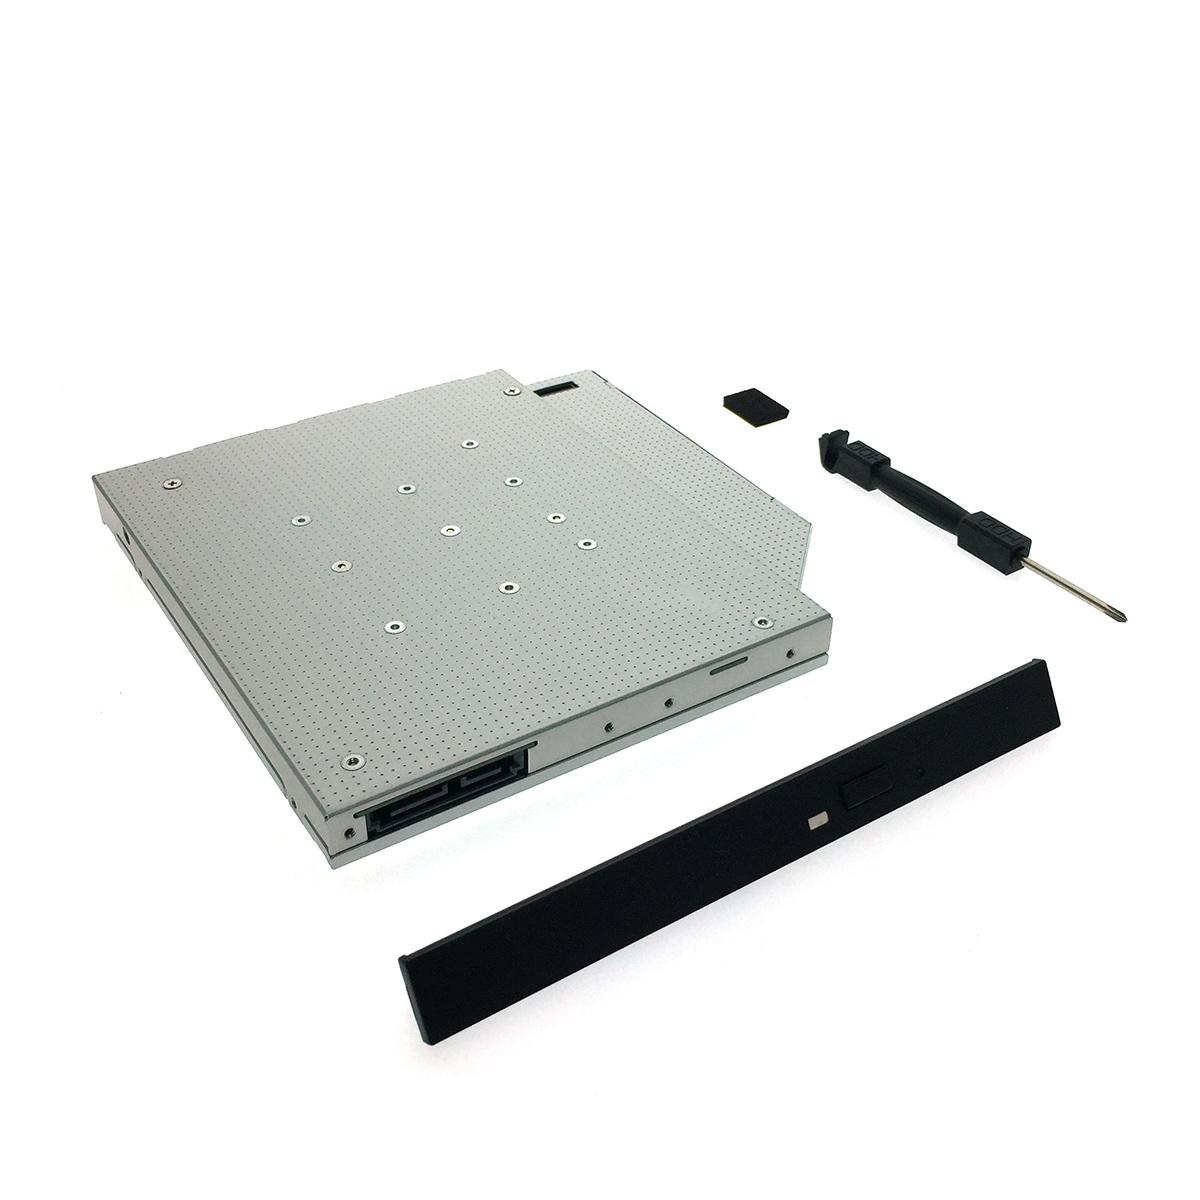 Адаптер оптибей Espada M2MS1295 mSATA/NGFF/M.2 SSD to miniSATA 12,7мм для подключения SSD mSATA/NGFF к ноутбуку вместо DVD